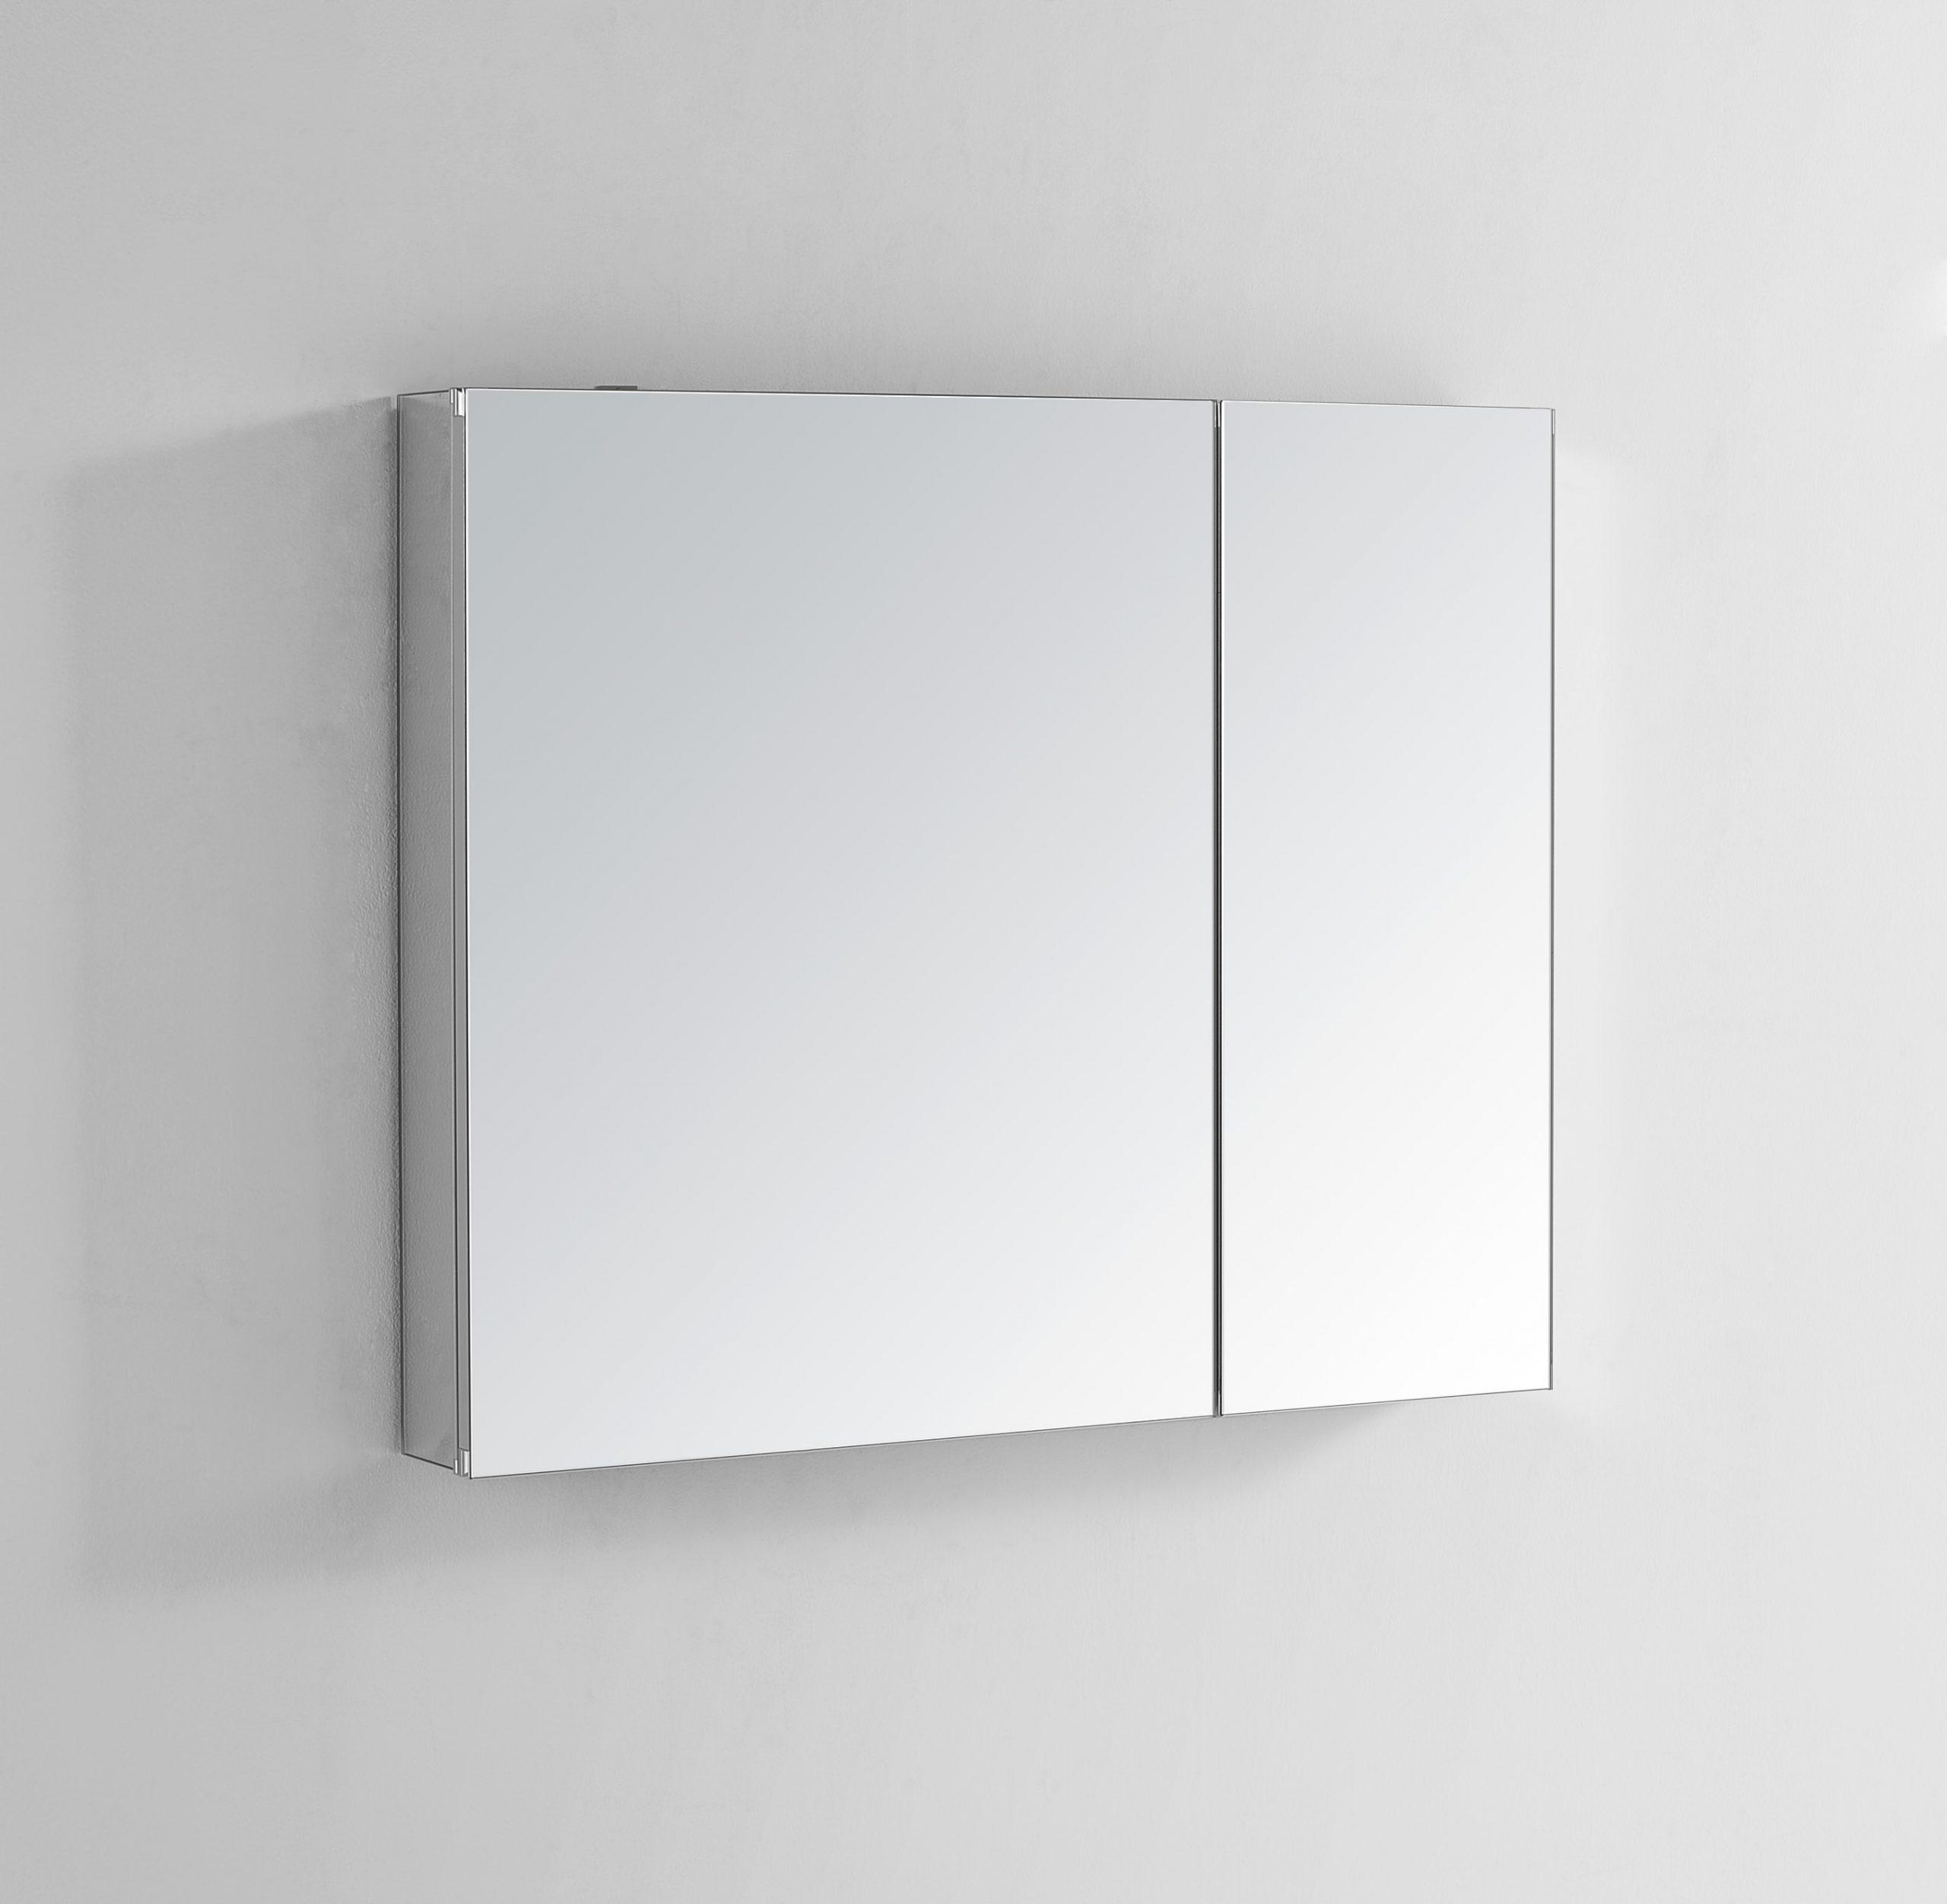 AQUADOM Royale 30 inches x 30 inches Medicine Mirror Glass Cabinet for Bathroom